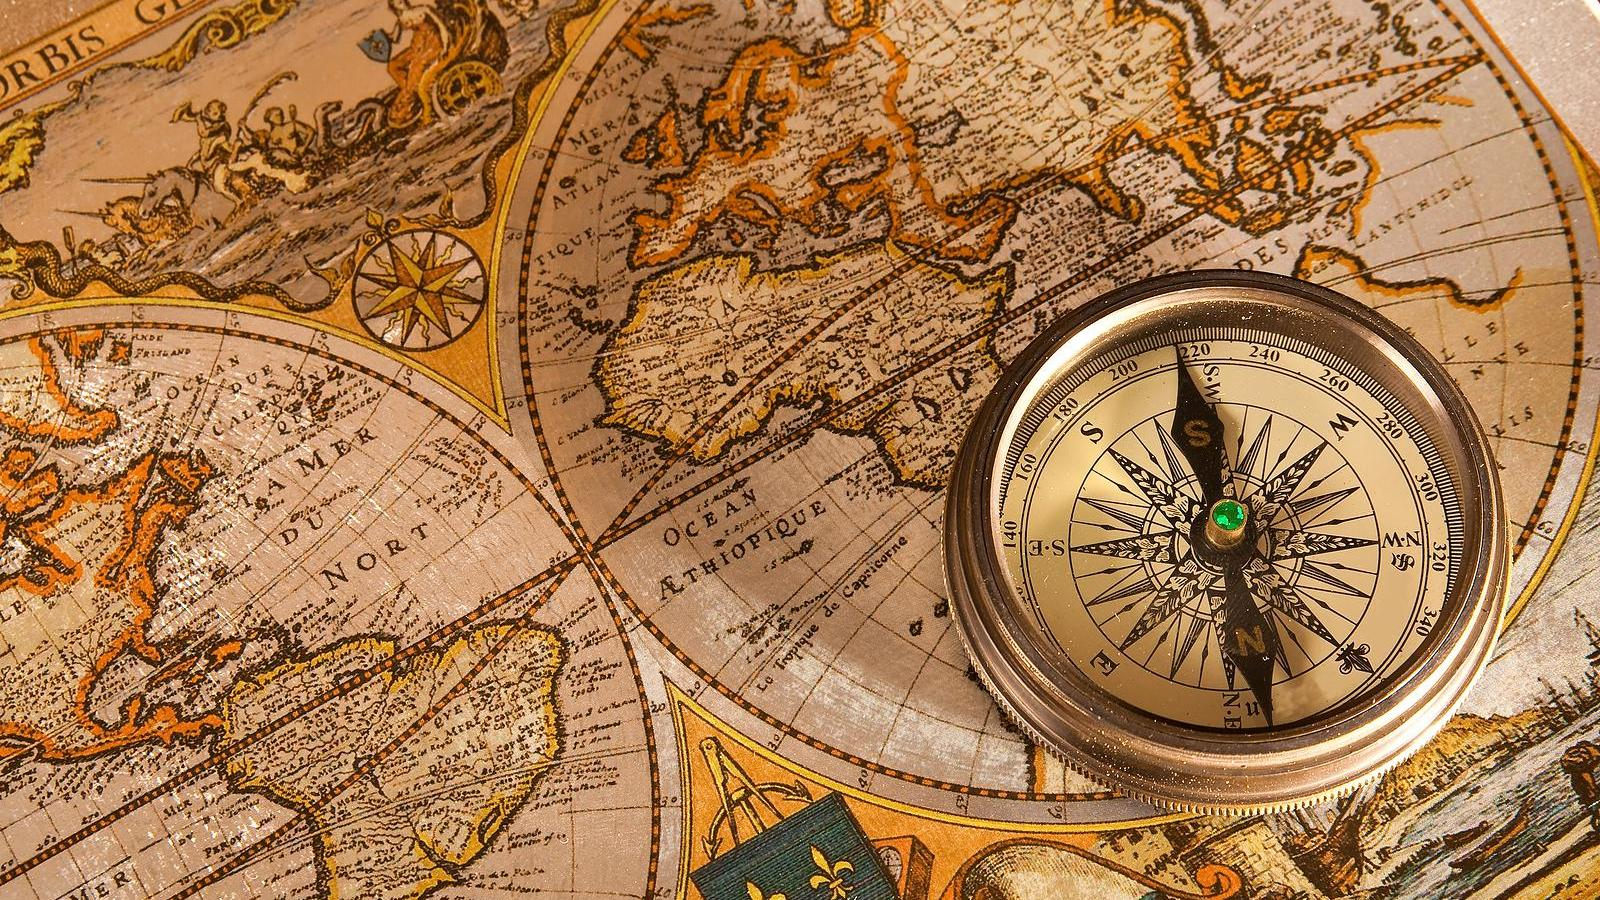 Mobile Wallpaper Inspirational Quotes Free Download Antique Map Background Pixelstalk Net